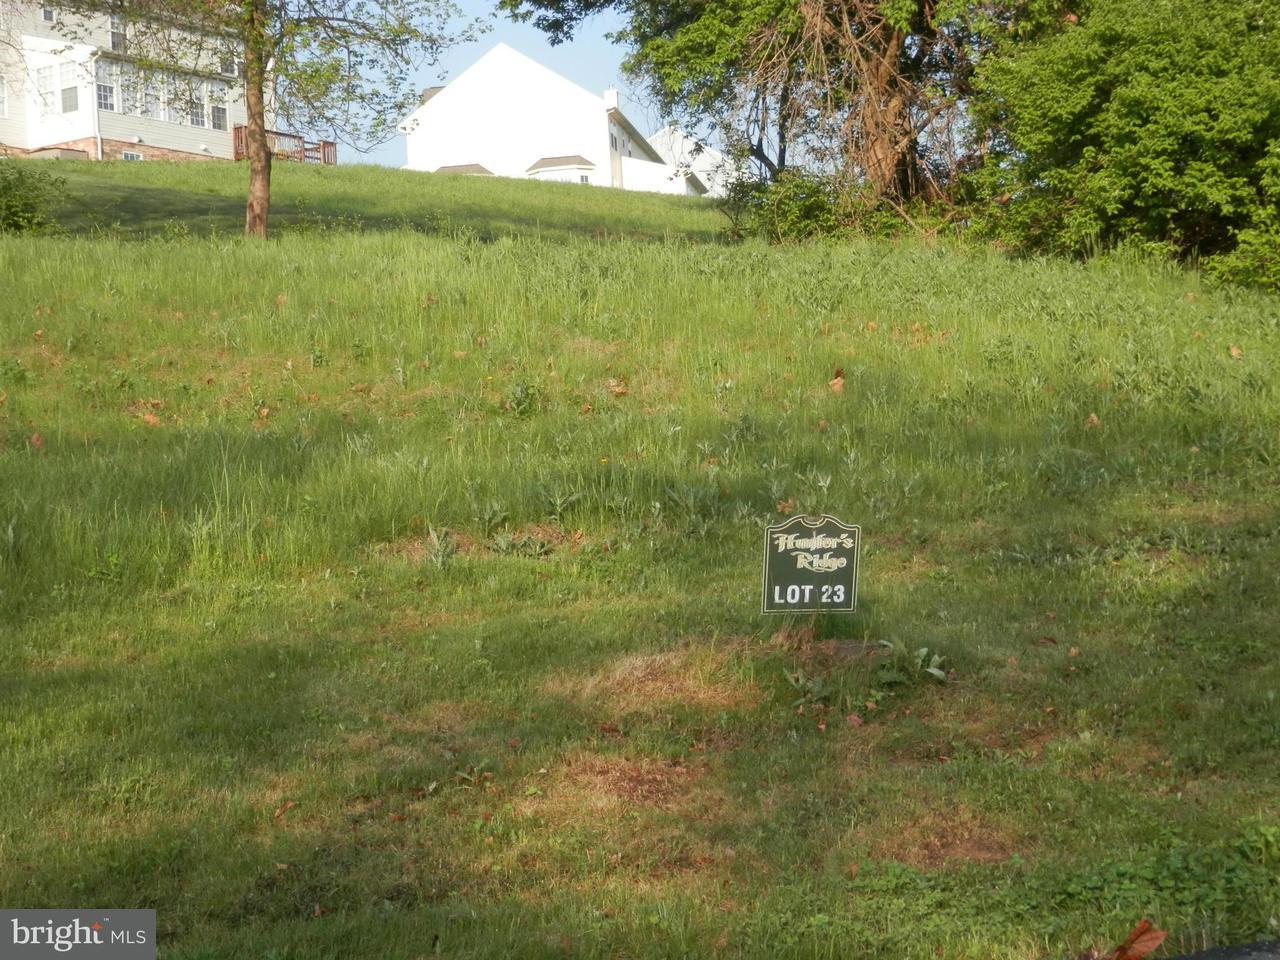 Land for Sale at Lot #23 Capri Ct Waynesboro, Pennsylvania 17268 United States